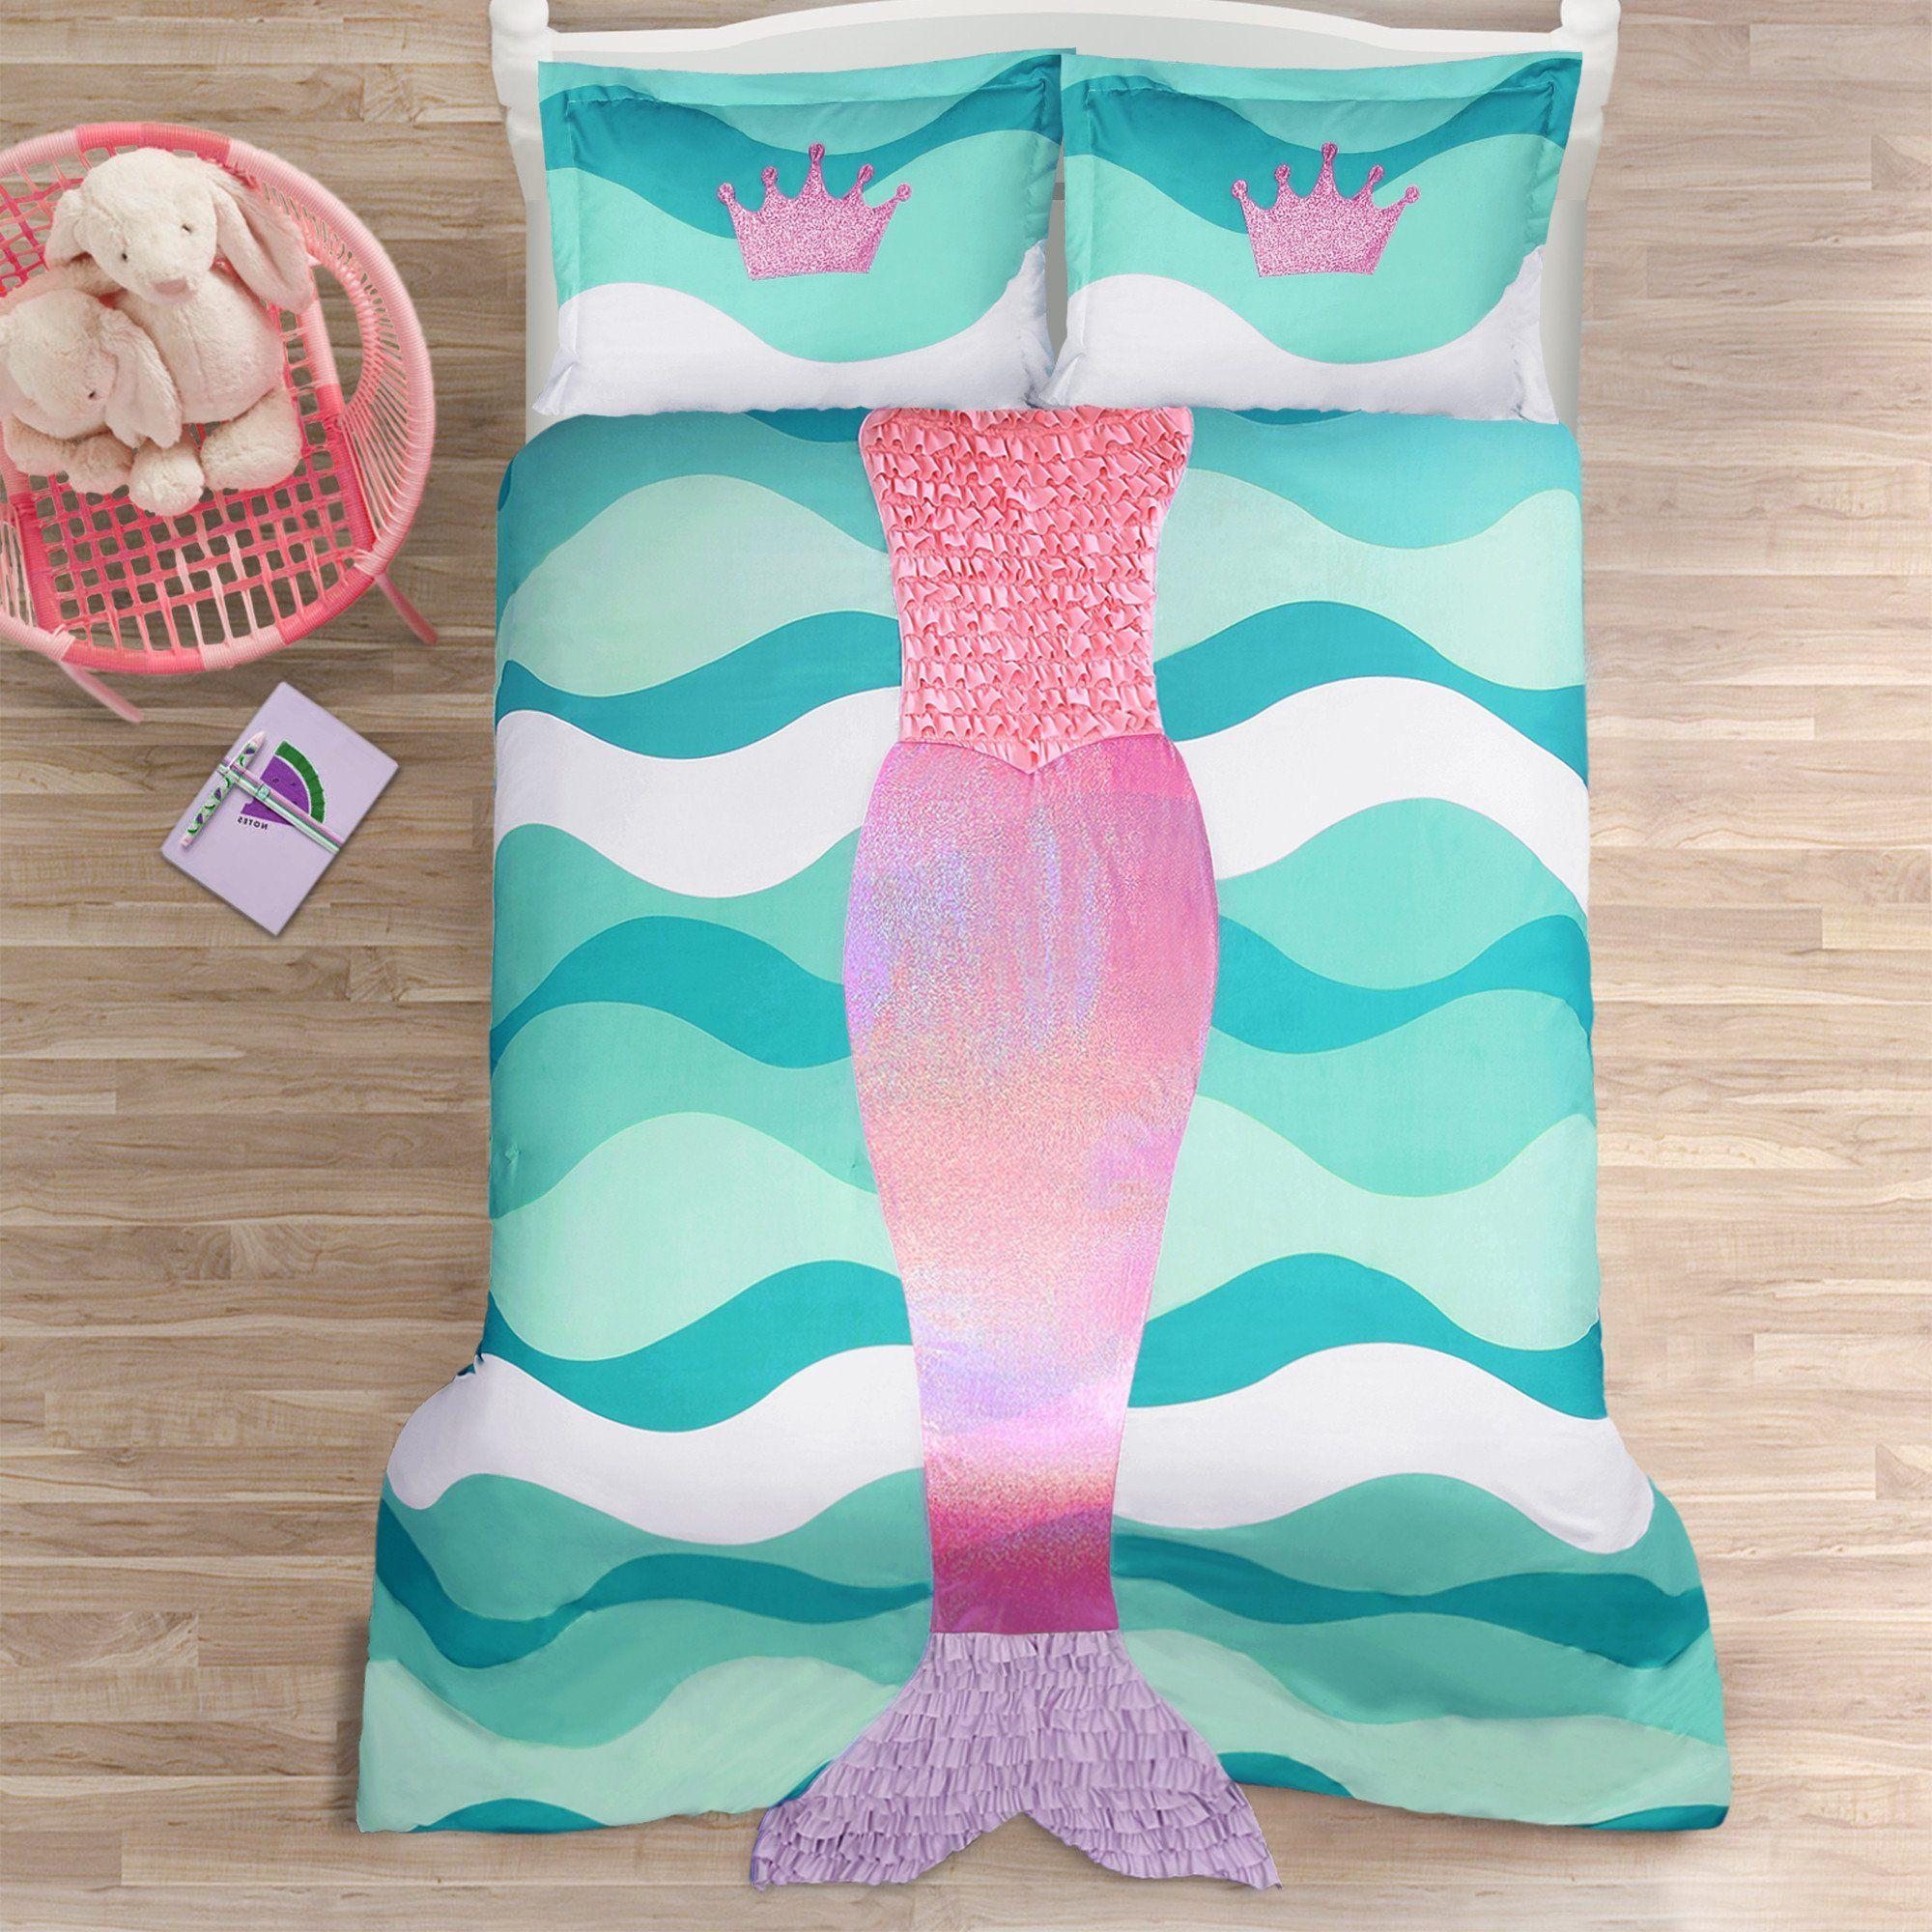 Mermaid Ruffle forter 2 Piece Set